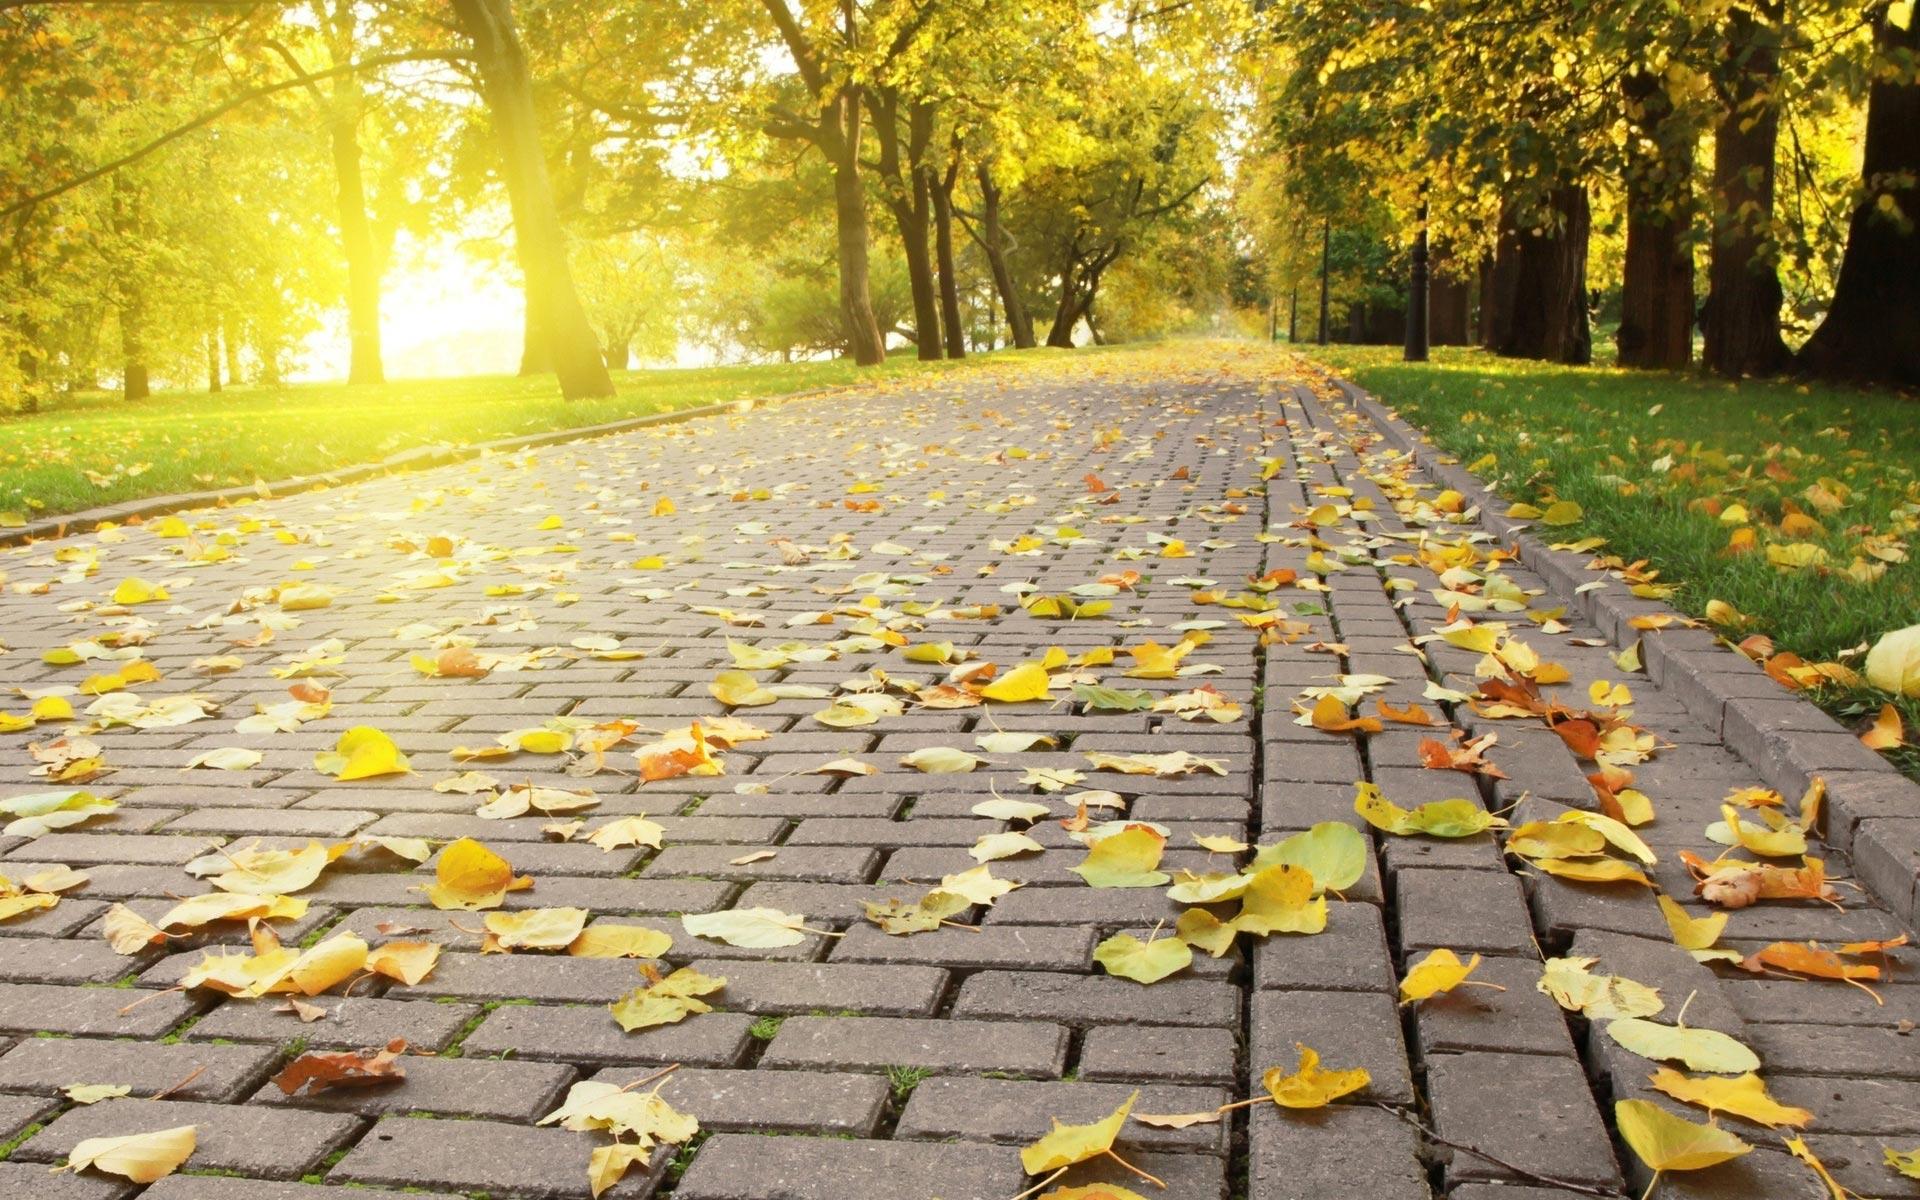 Hd wallpaper wide - Hd Wallpapers Nature Landscape Autumn Widescreen Hd Wallpapers